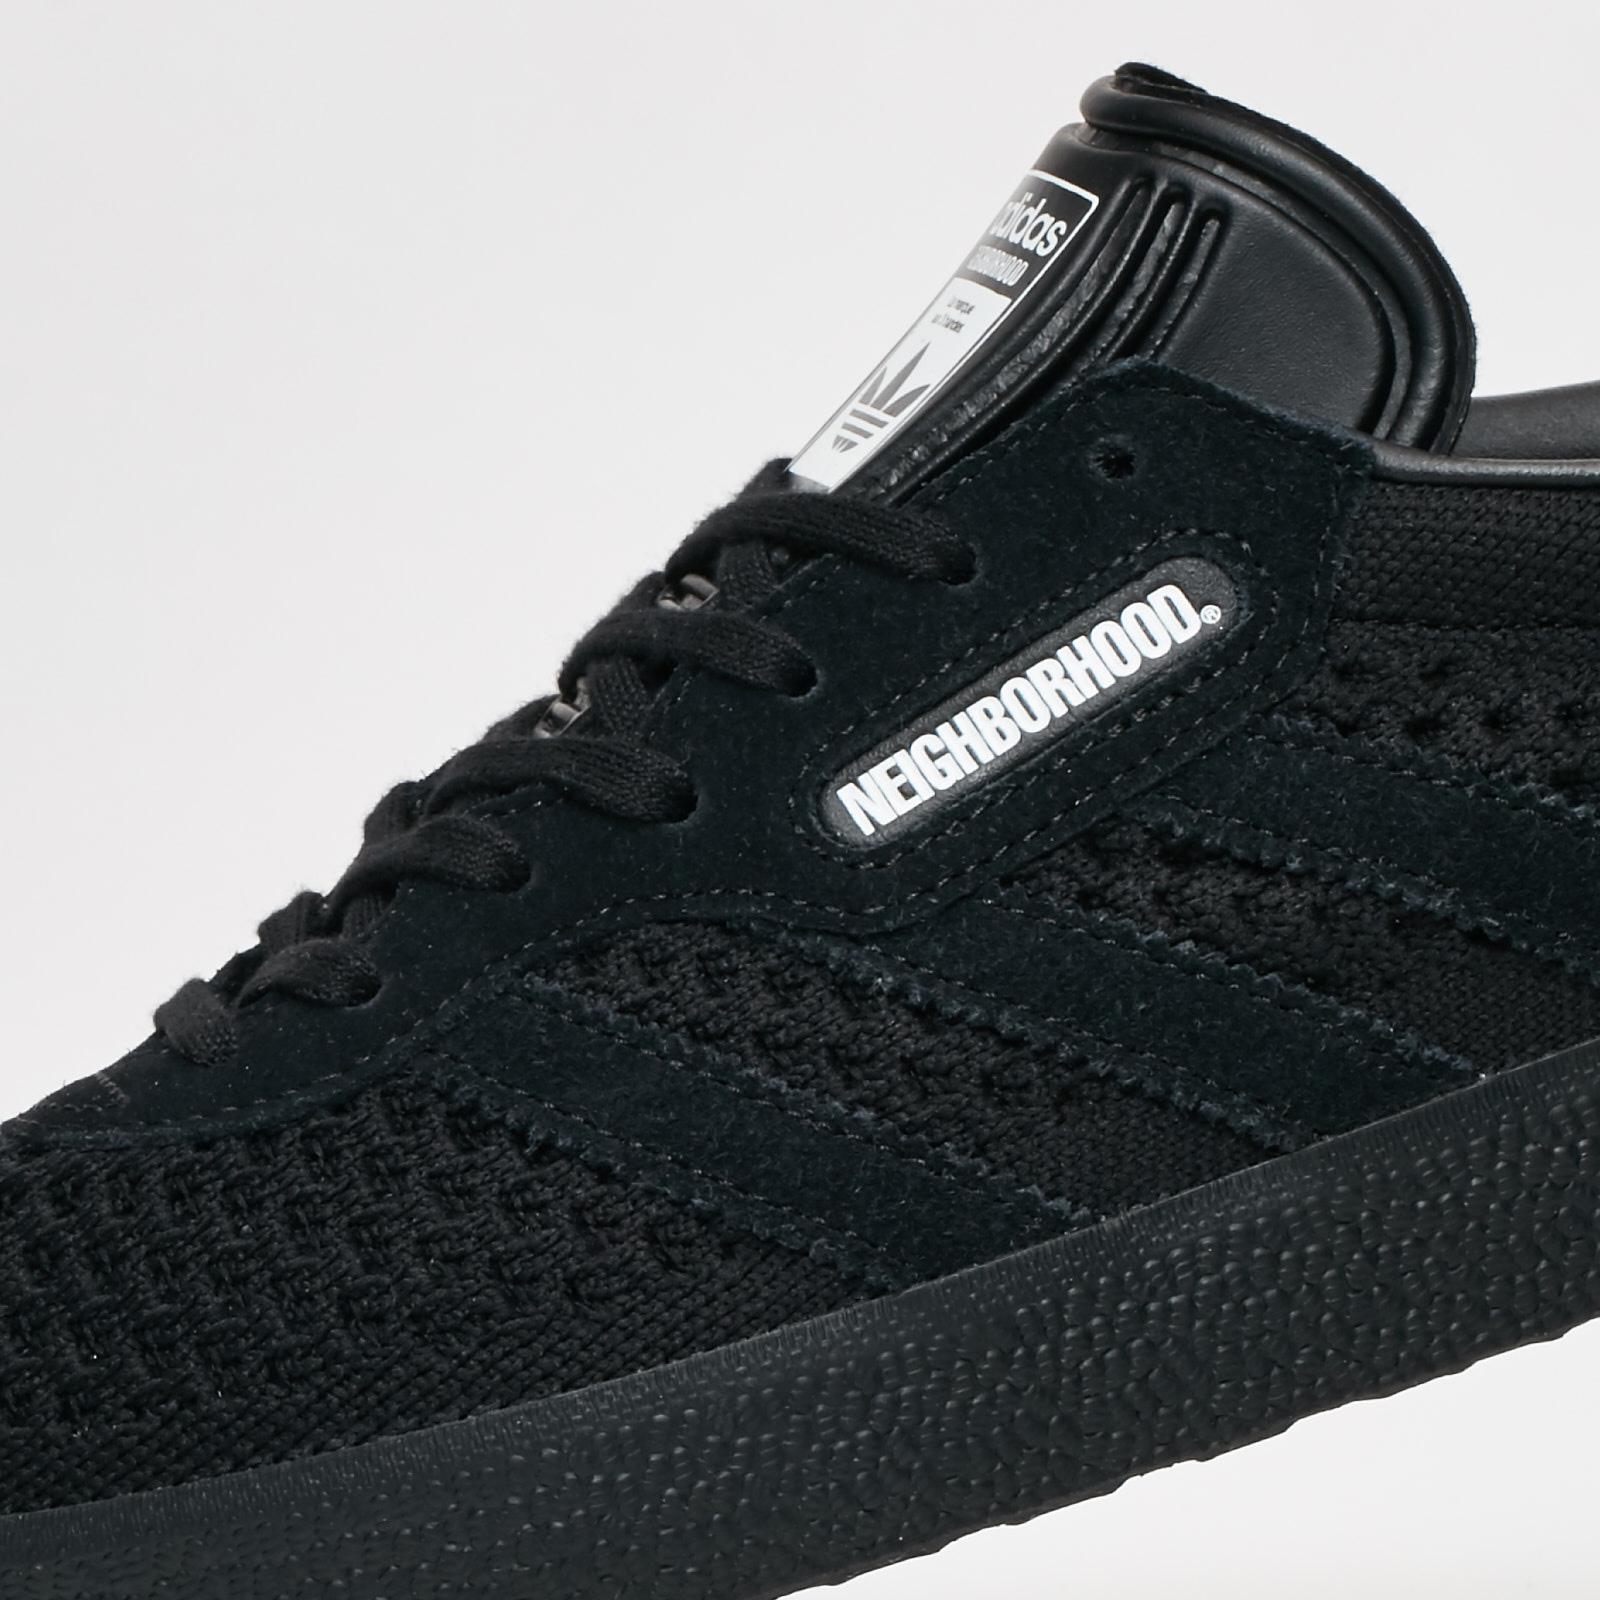 cheap for discount 6bc03 30f35 ... adidas Originals Gazelle Super x Neighborhood ...